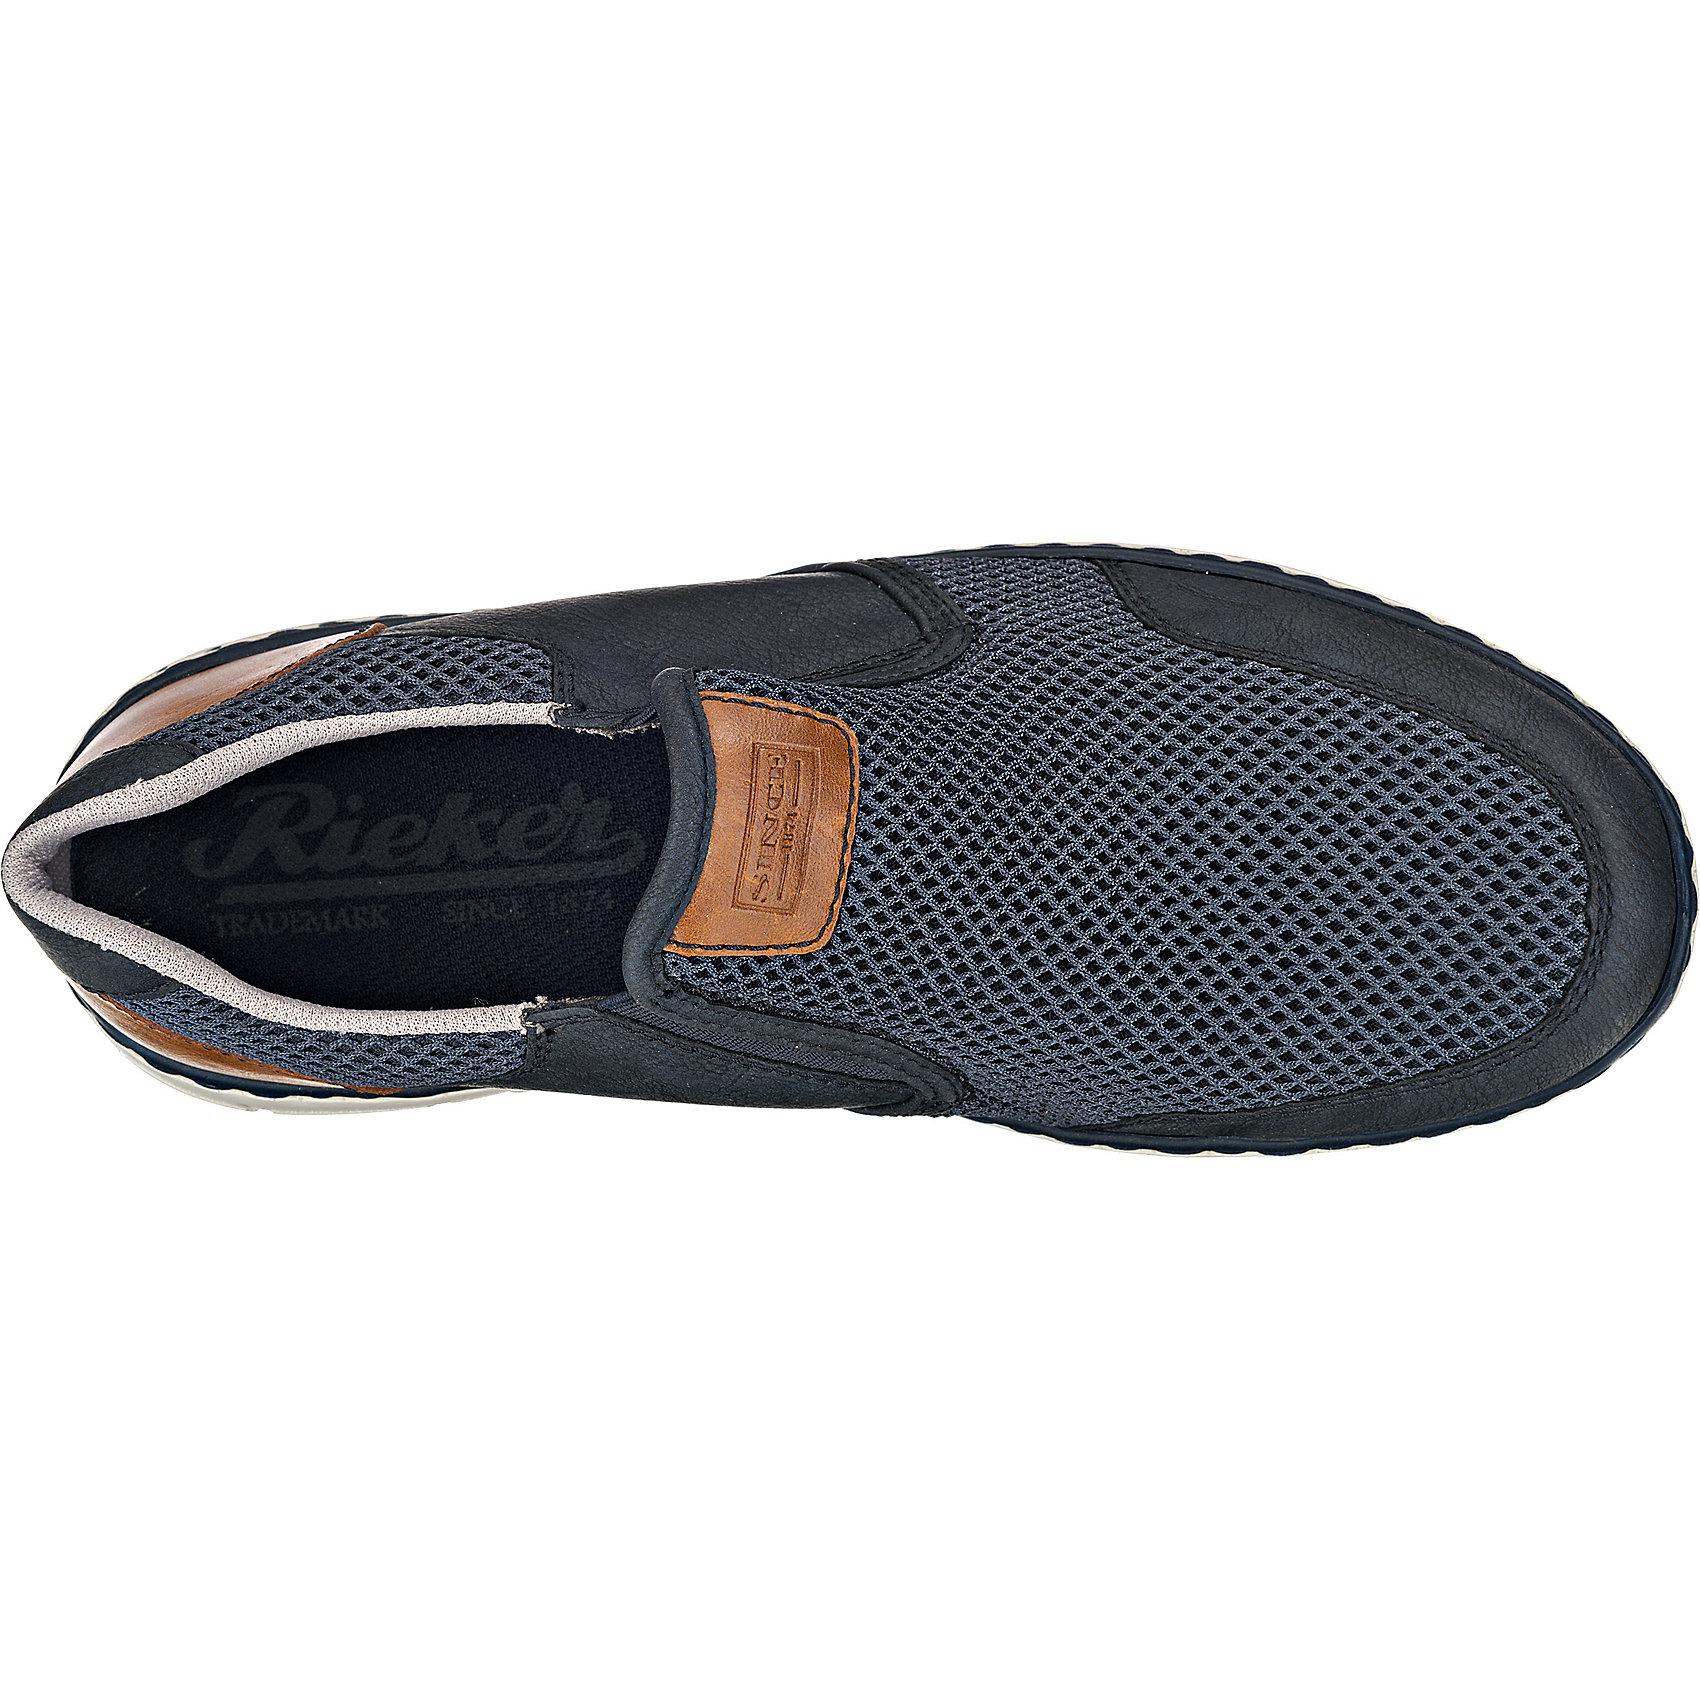 Neu Sneakers rieker Sneakers Neu 5768740 für Herren dunkelblau f3b54a